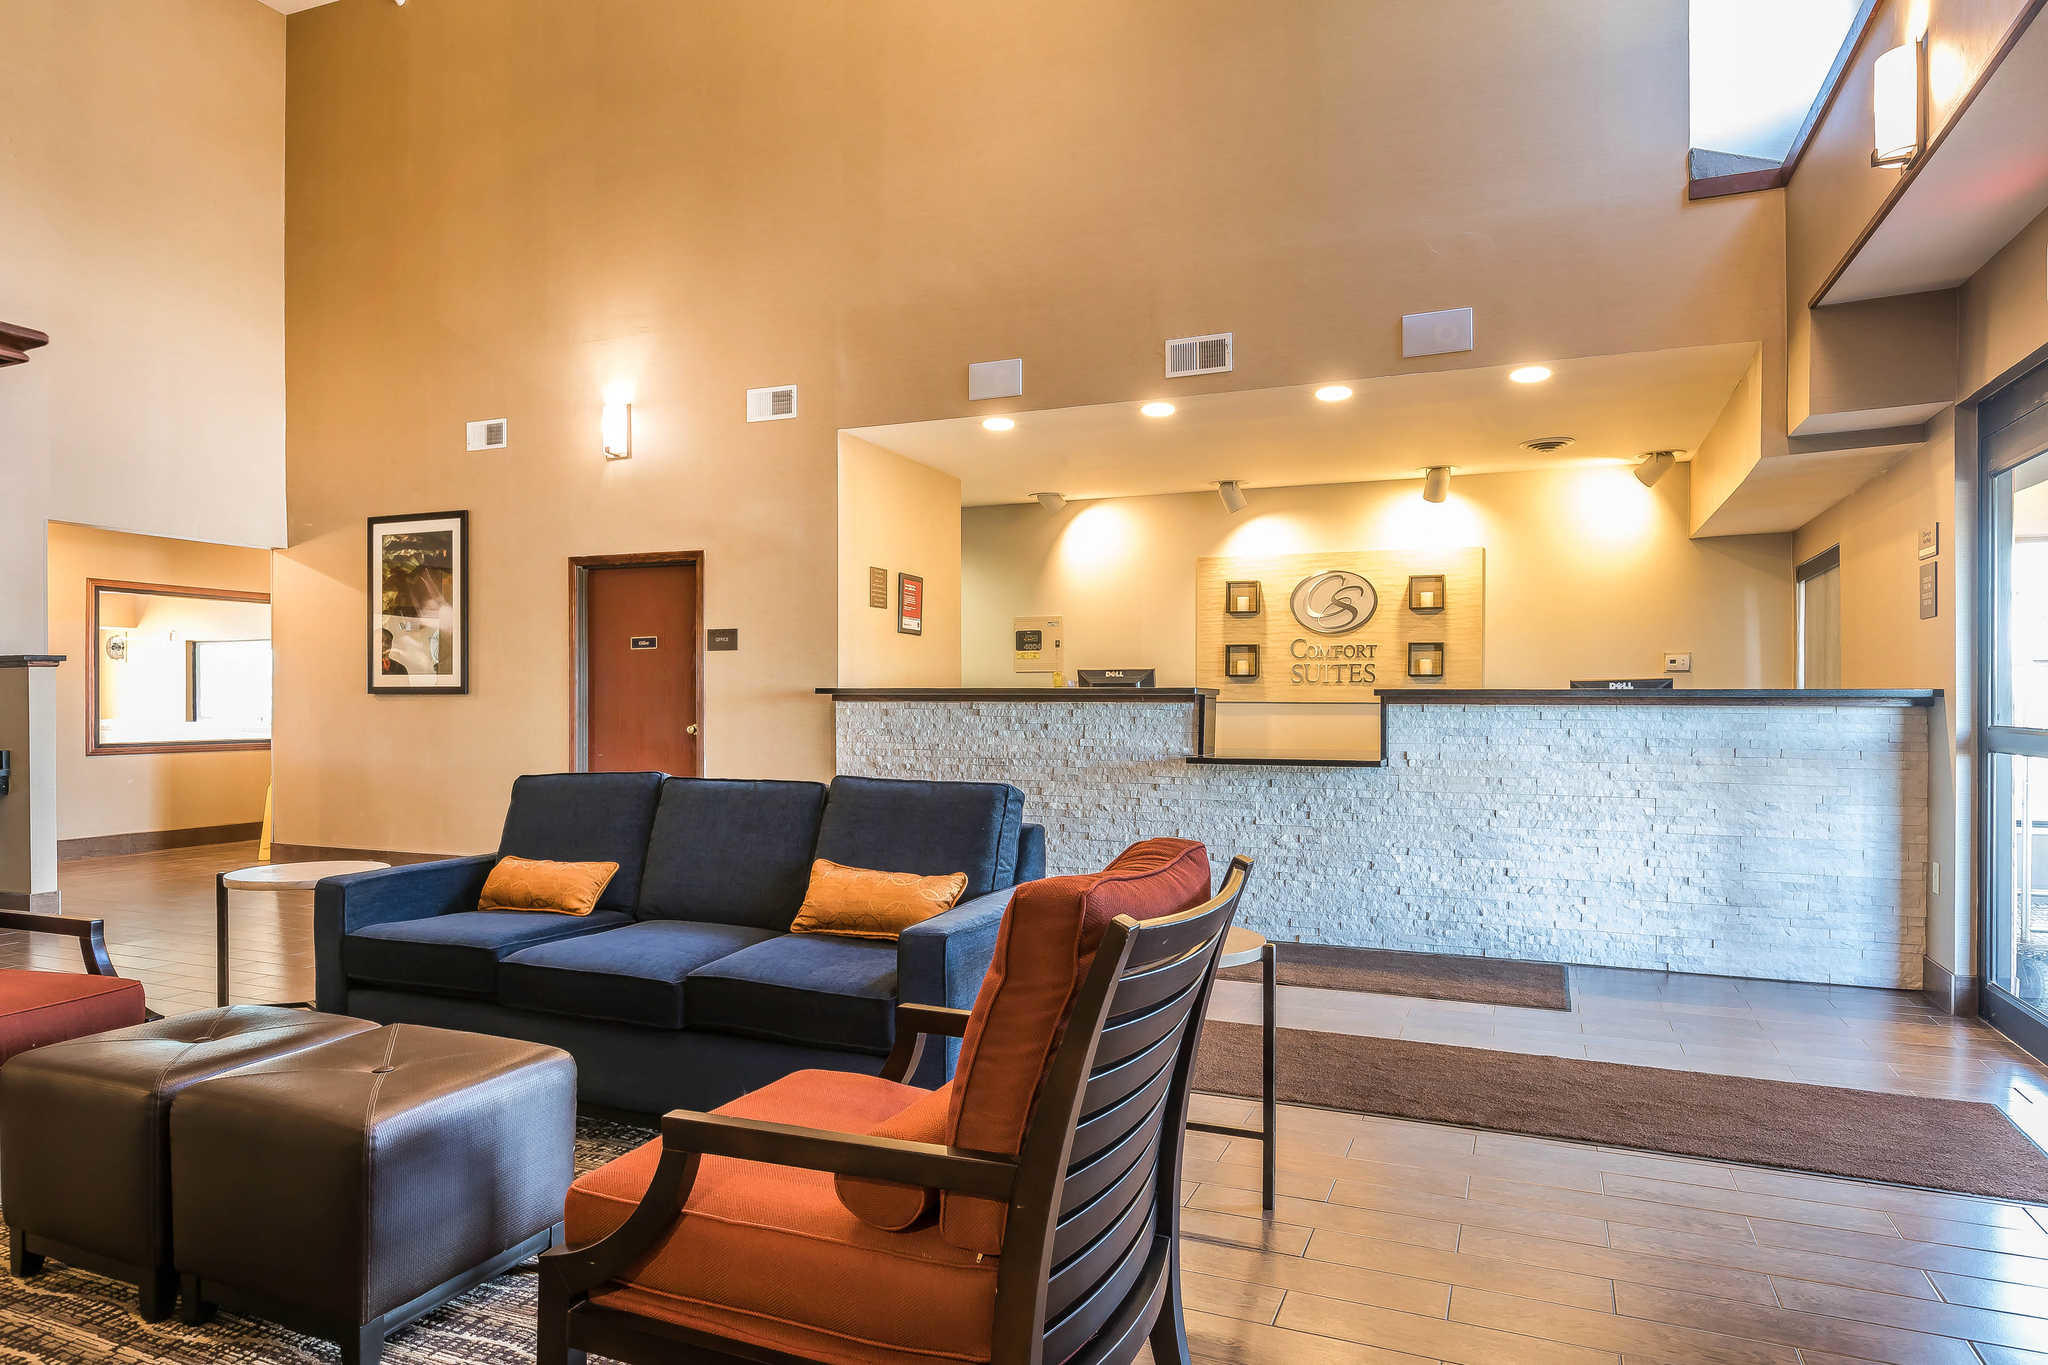 Comfort Suites North image 19